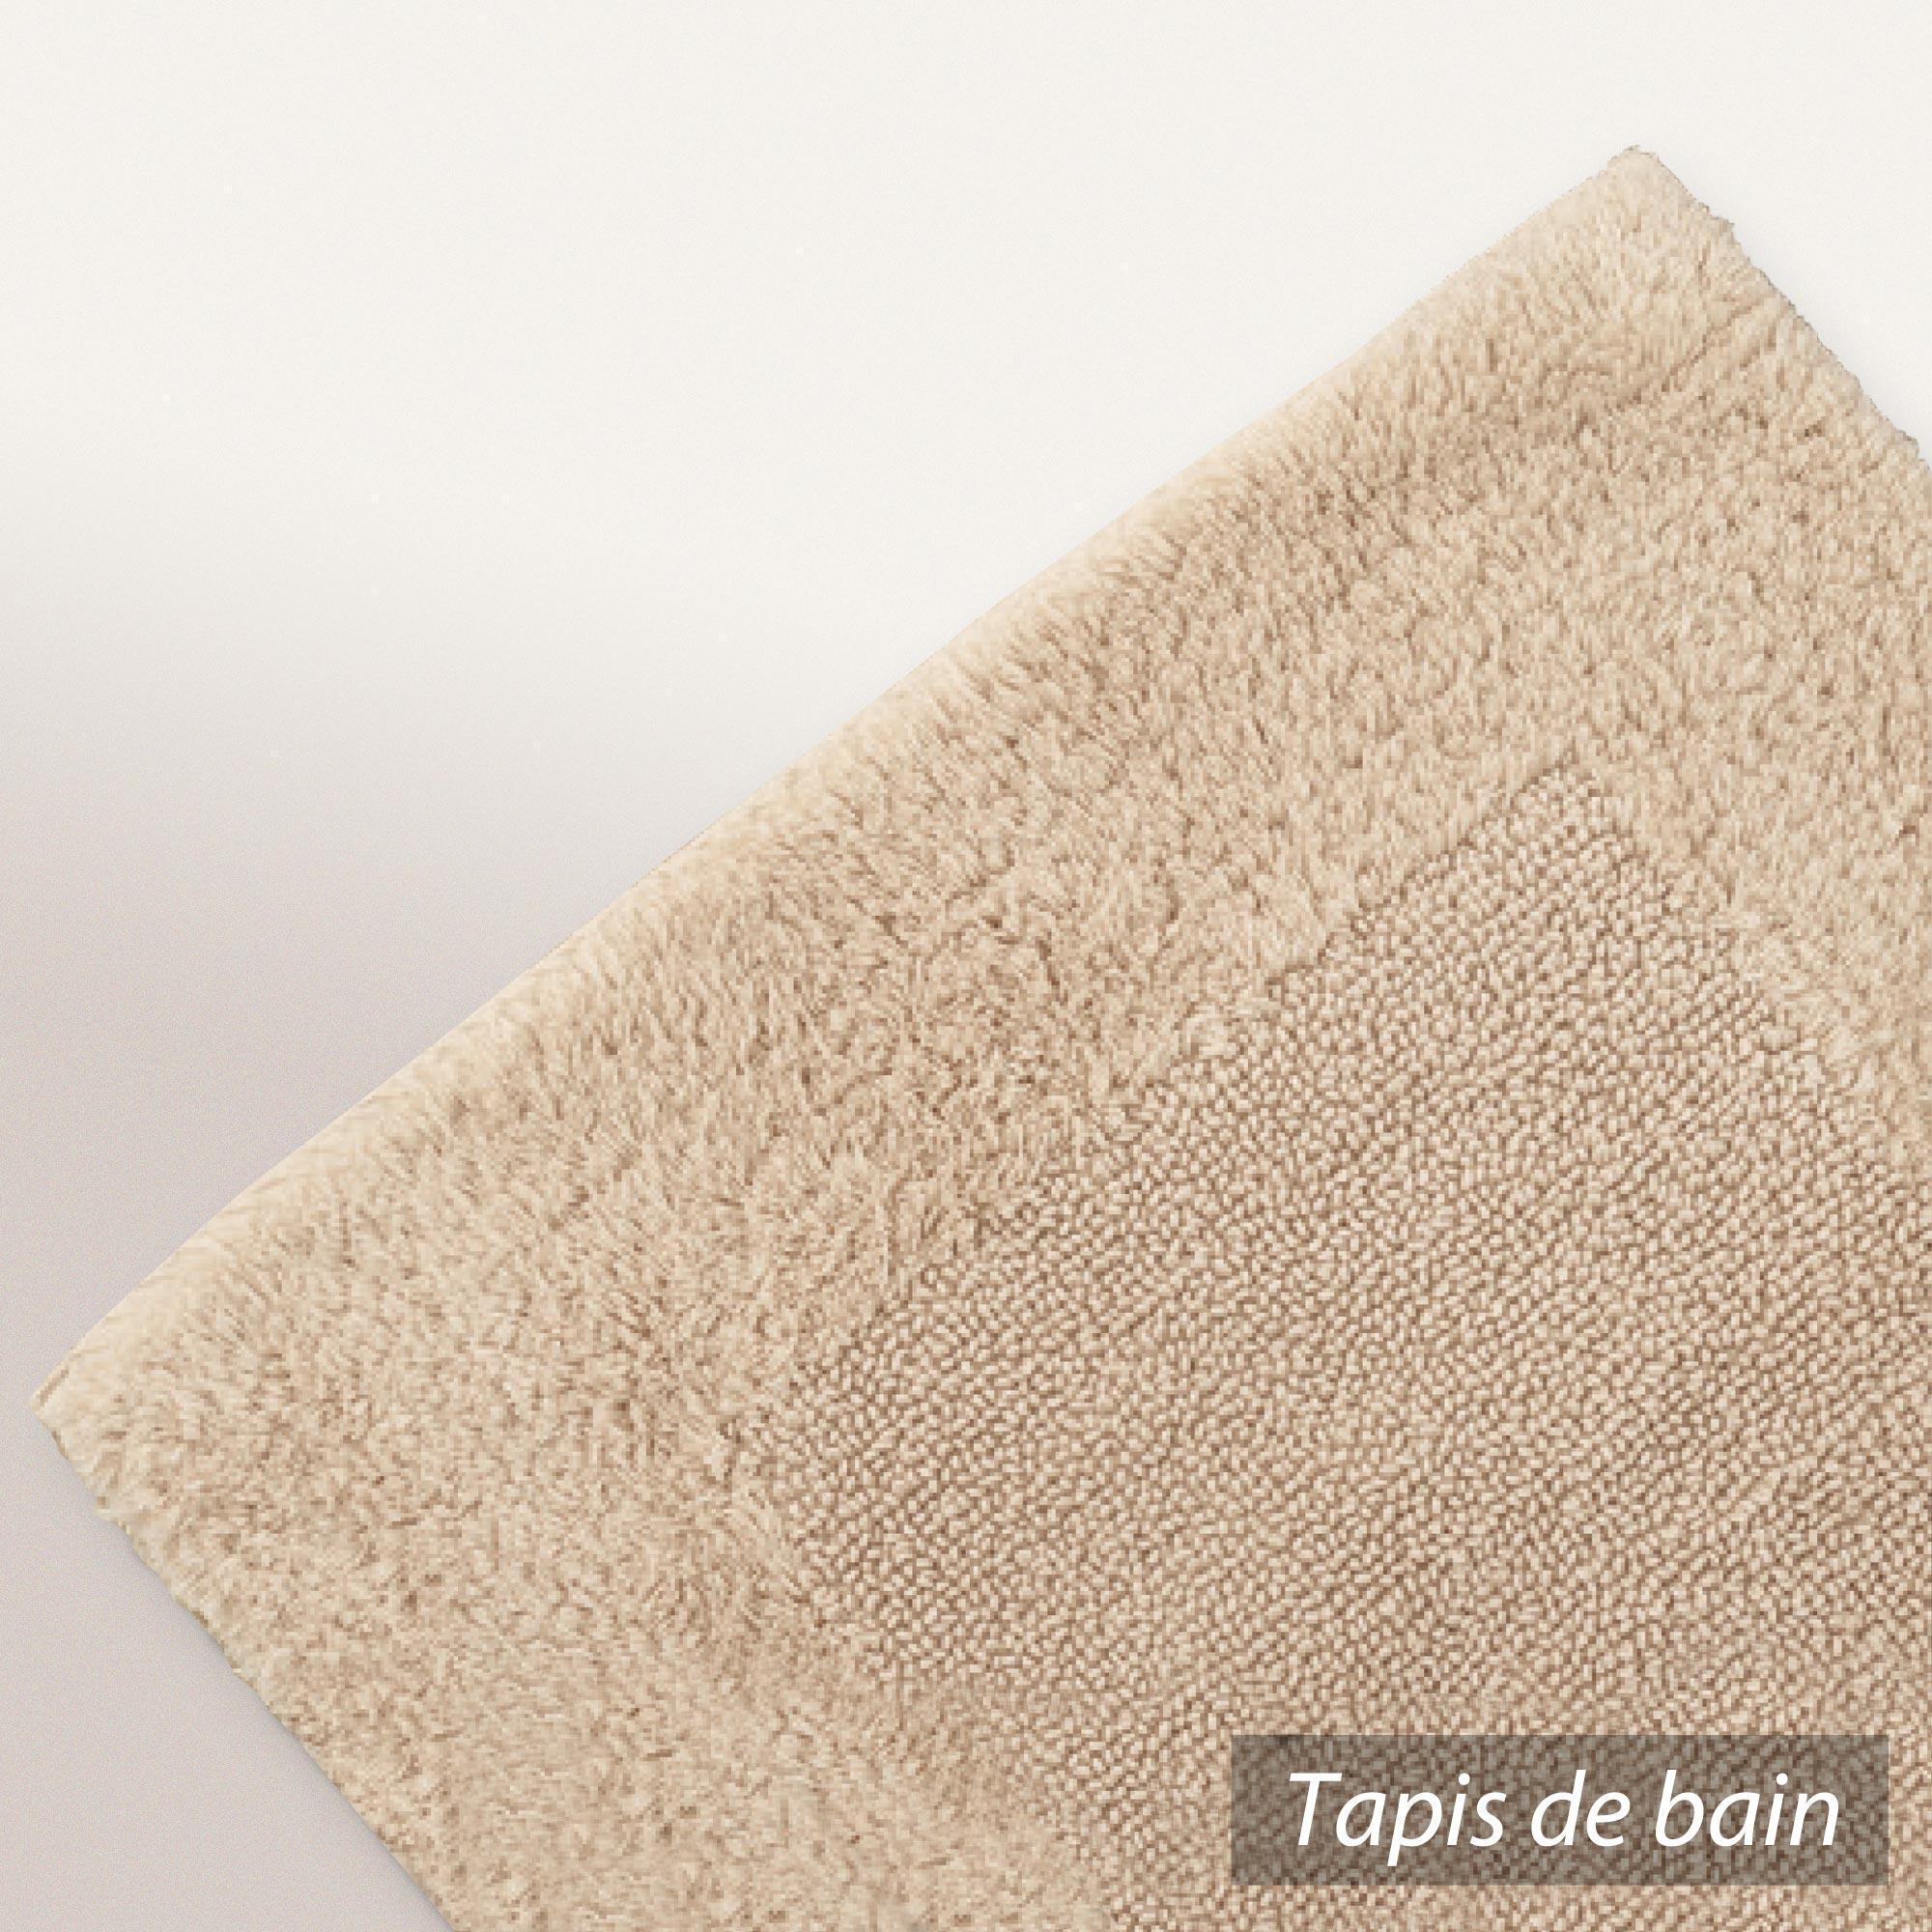 tapis de bain 60x60 cm luxor beige 2000 g m2. Black Bedroom Furniture Sets. Home Design Ideas